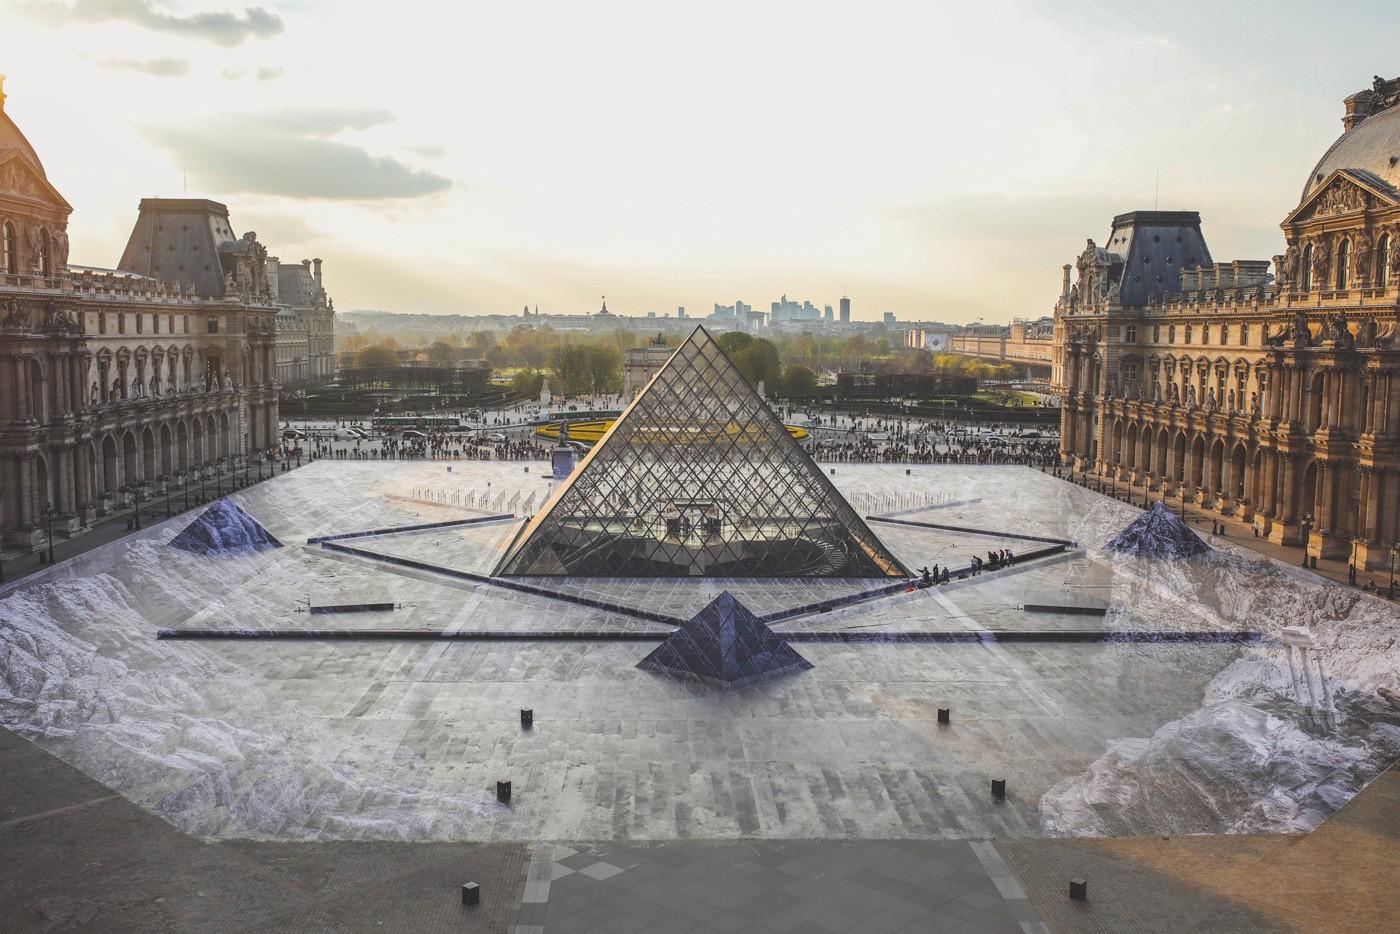 https _hypebeast.com_image_2019_03_jr-louvre-paris-optical-illusion-pasting-transformation-01